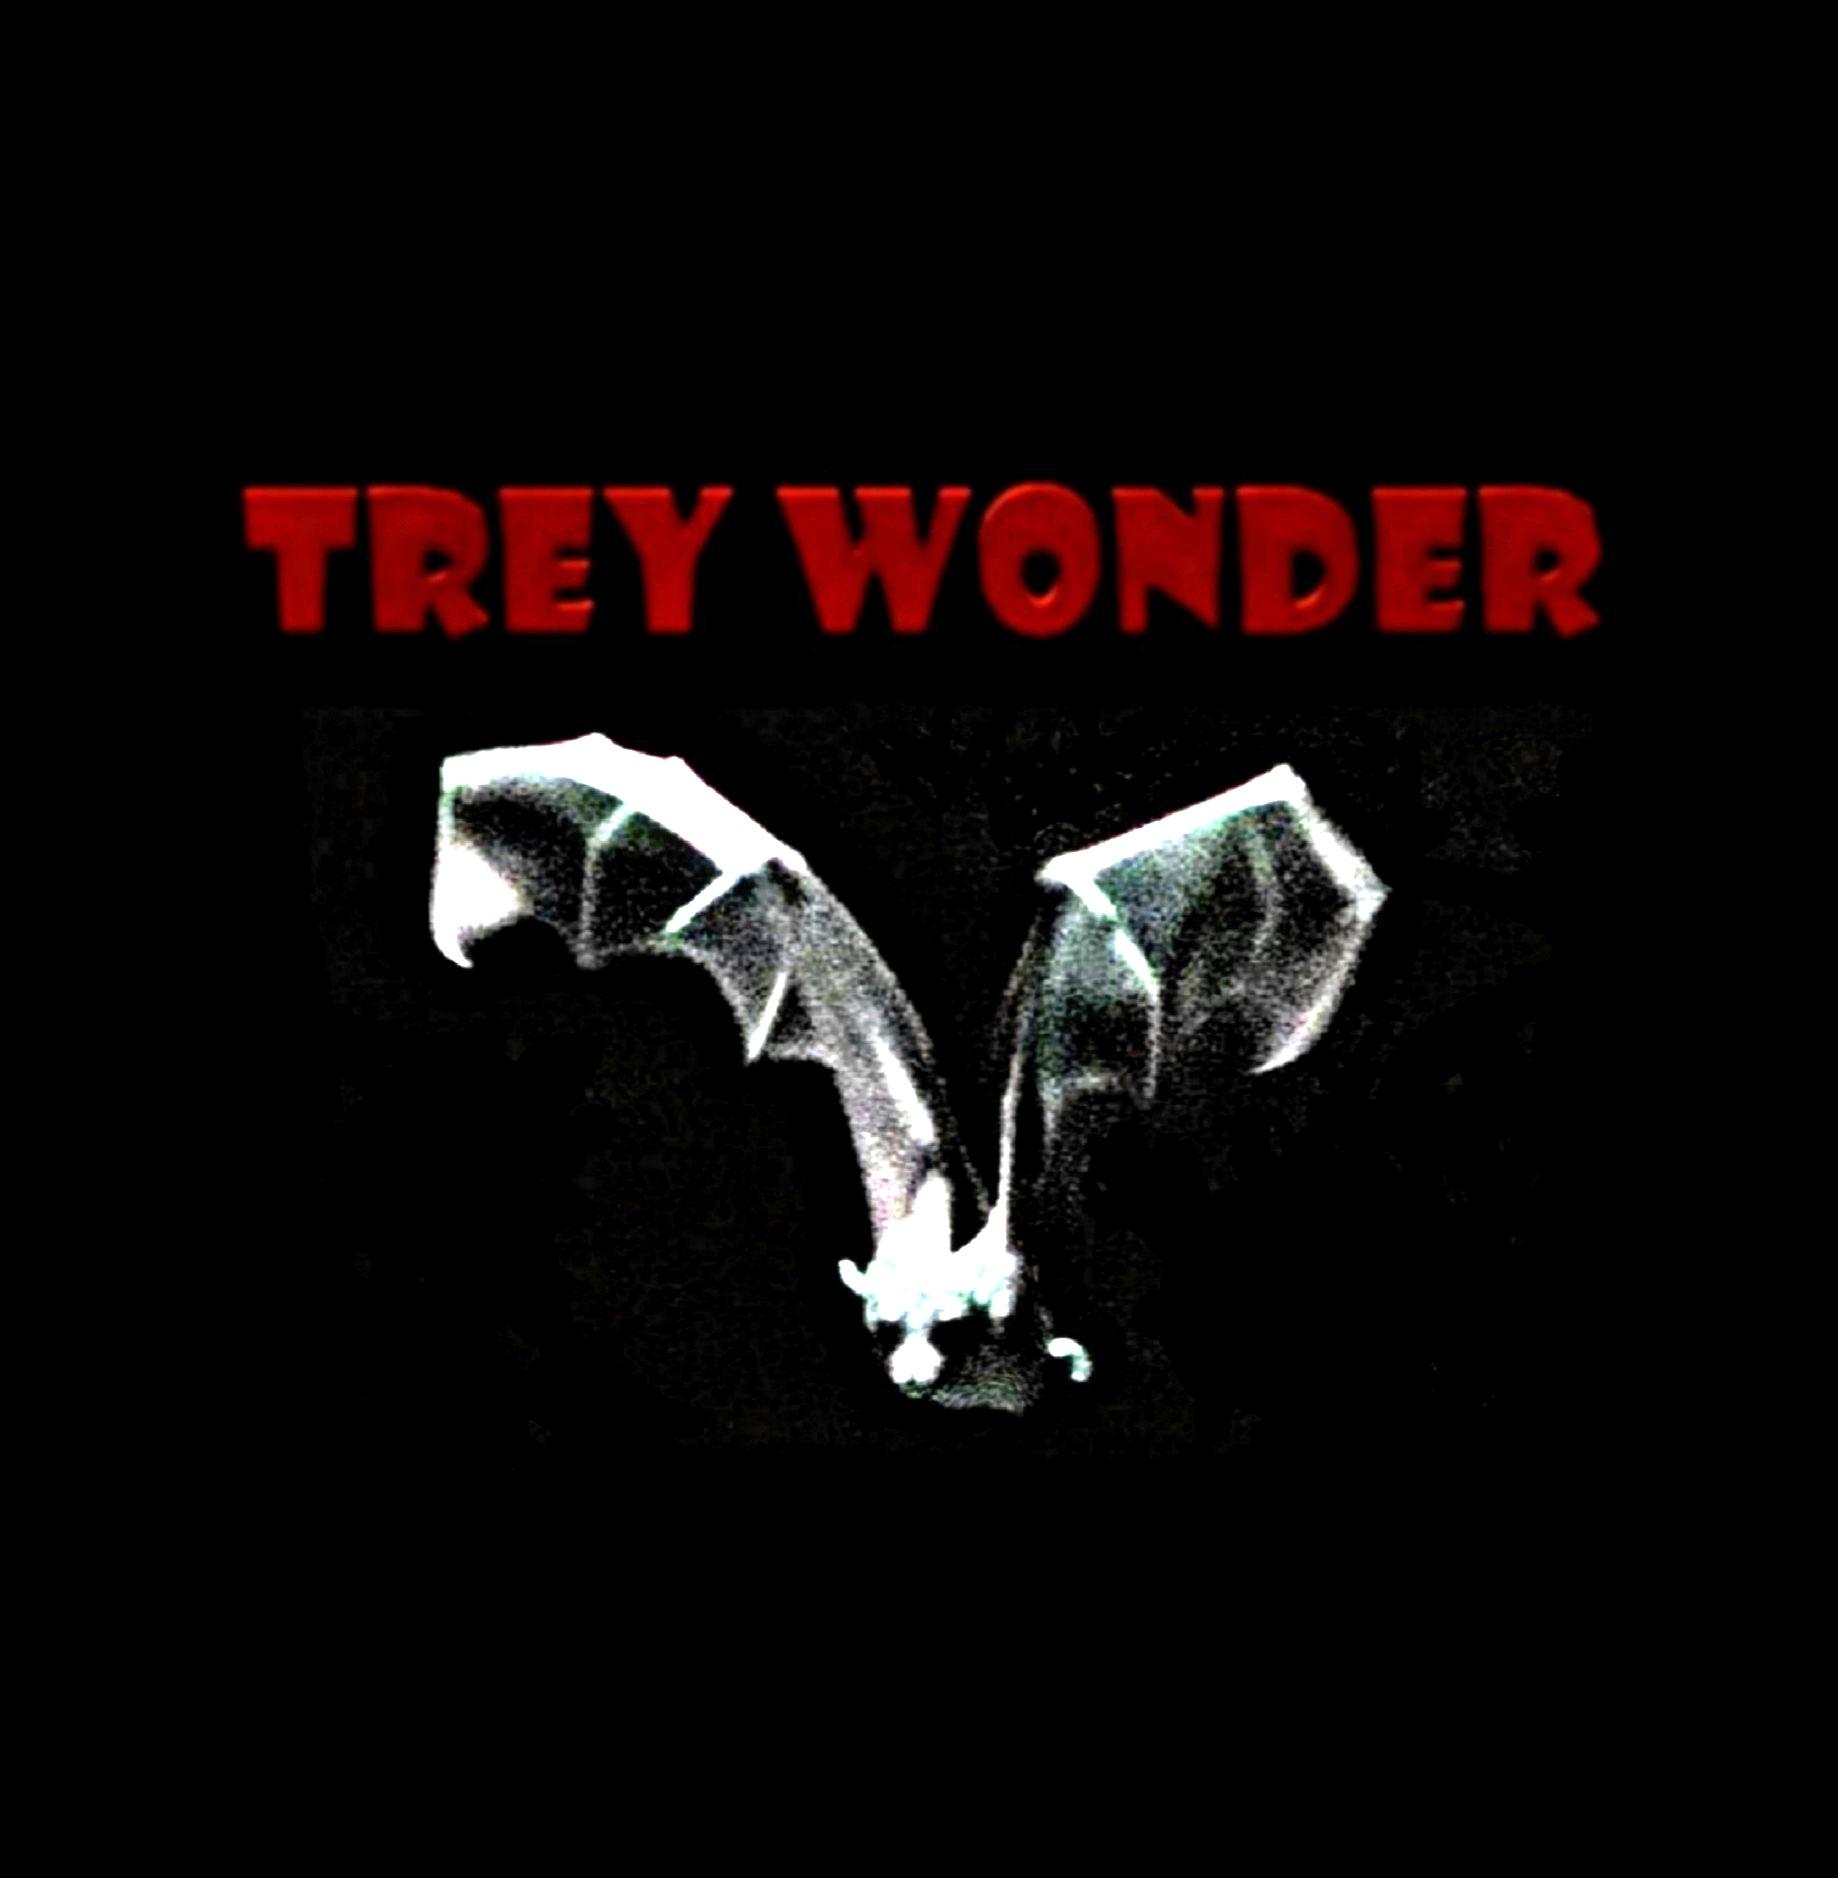 Trey Wonder Drops A New Single Titled 'Battle Midnight'